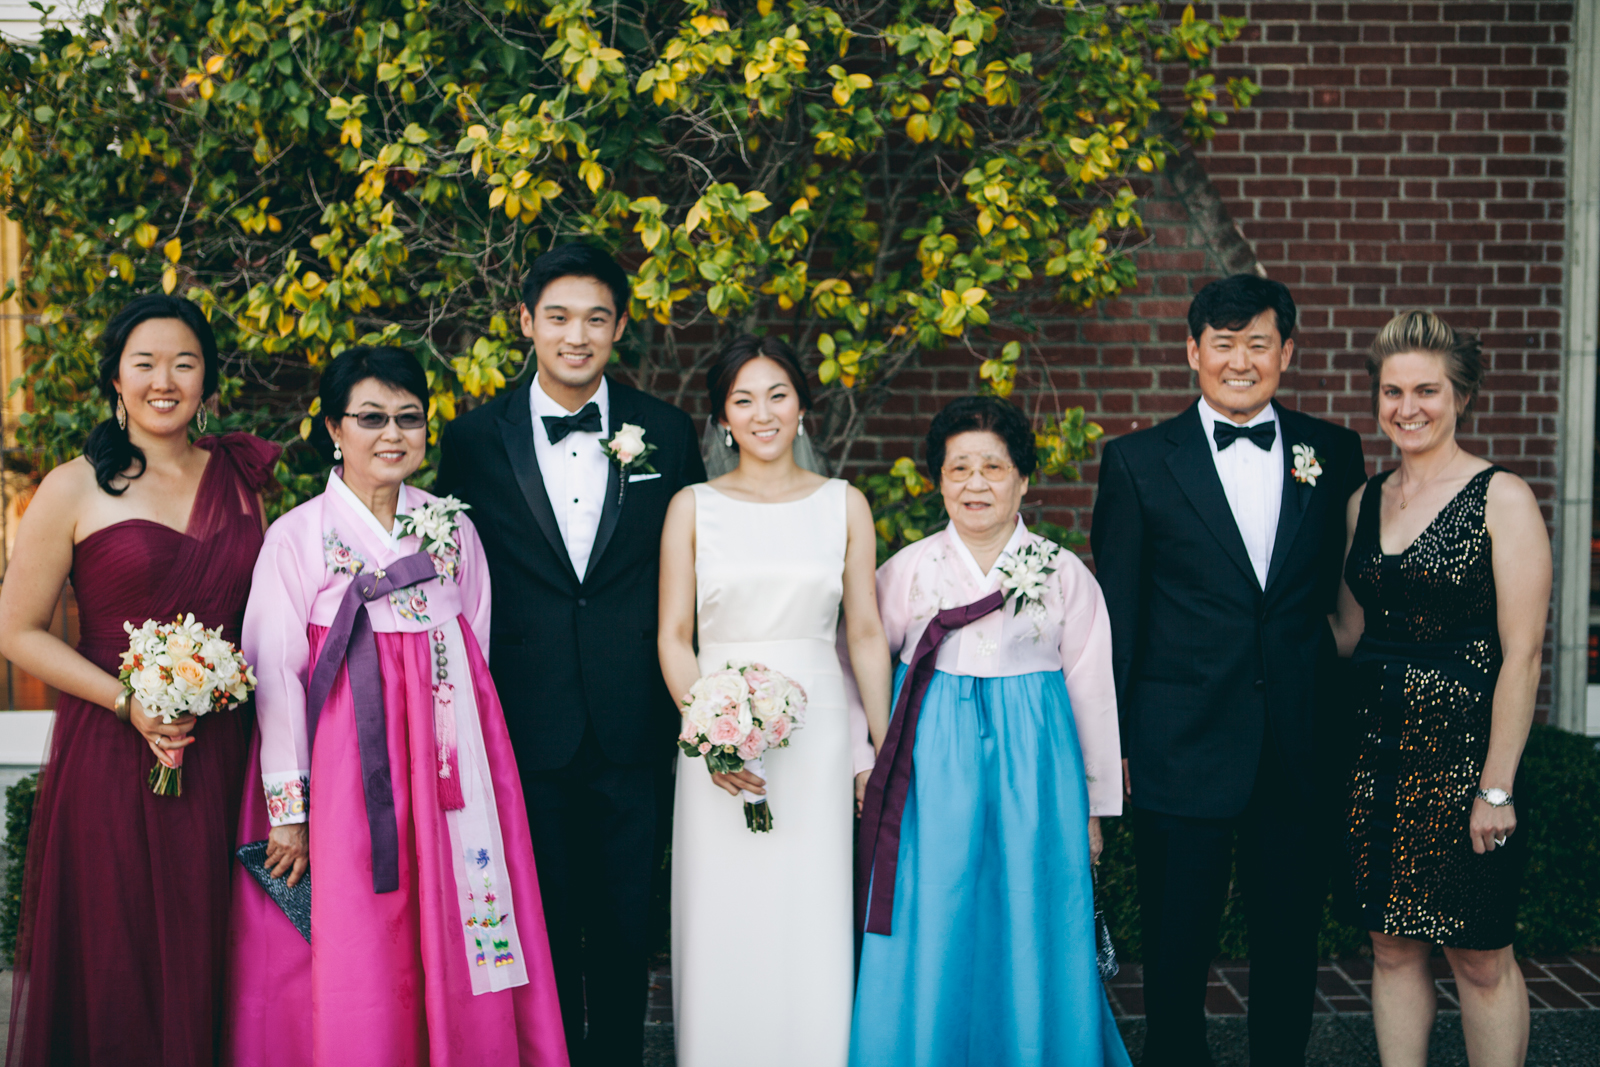 kohl_manison_wedding_photography_sarah_eric_ebony_siovhan_bokeh_photography_049.jpg